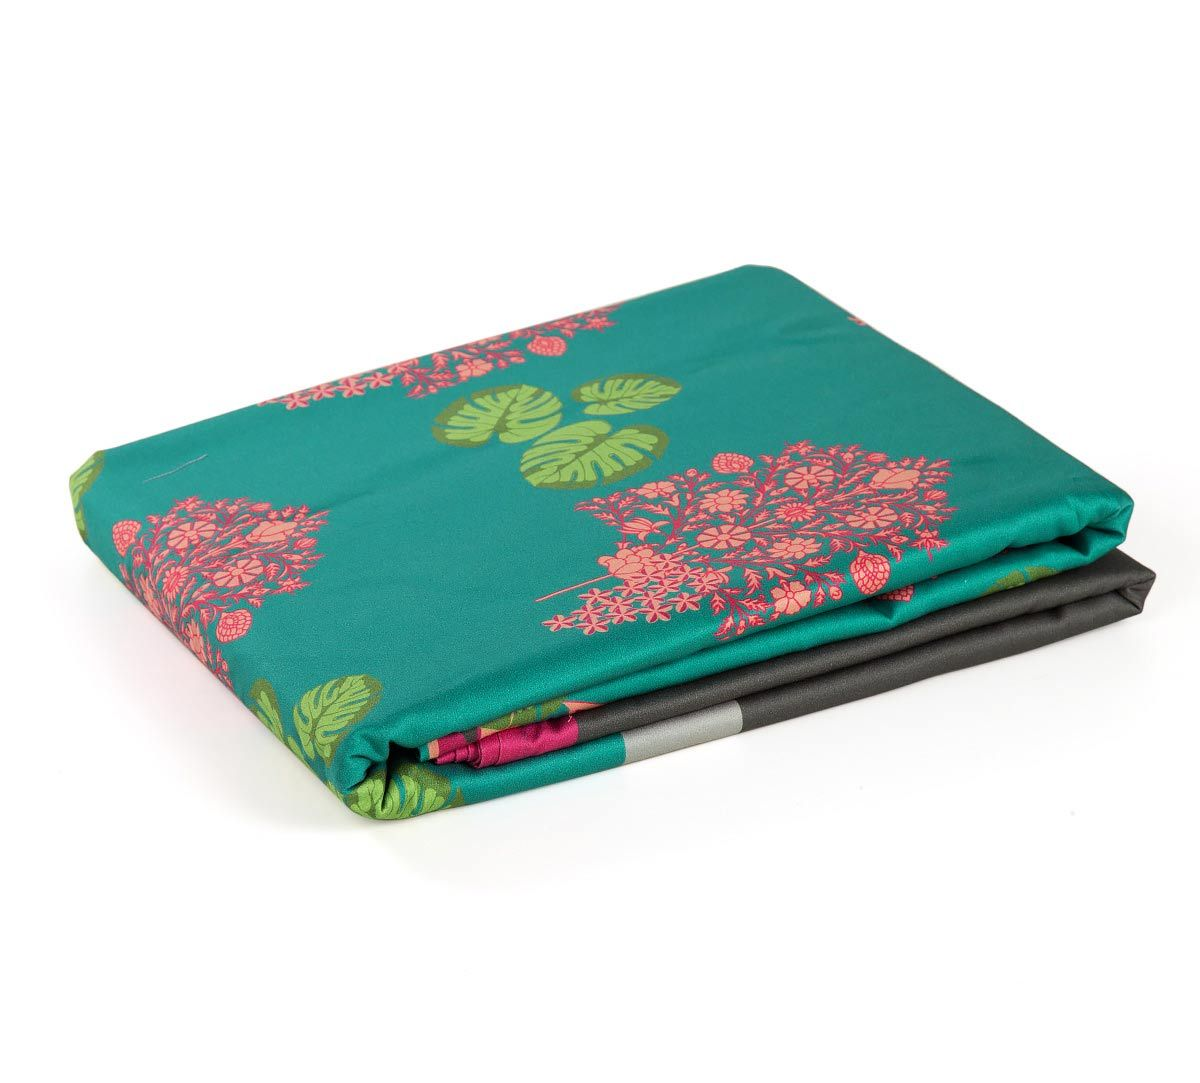 India Circus Lissom Lotus Bed sheet Set